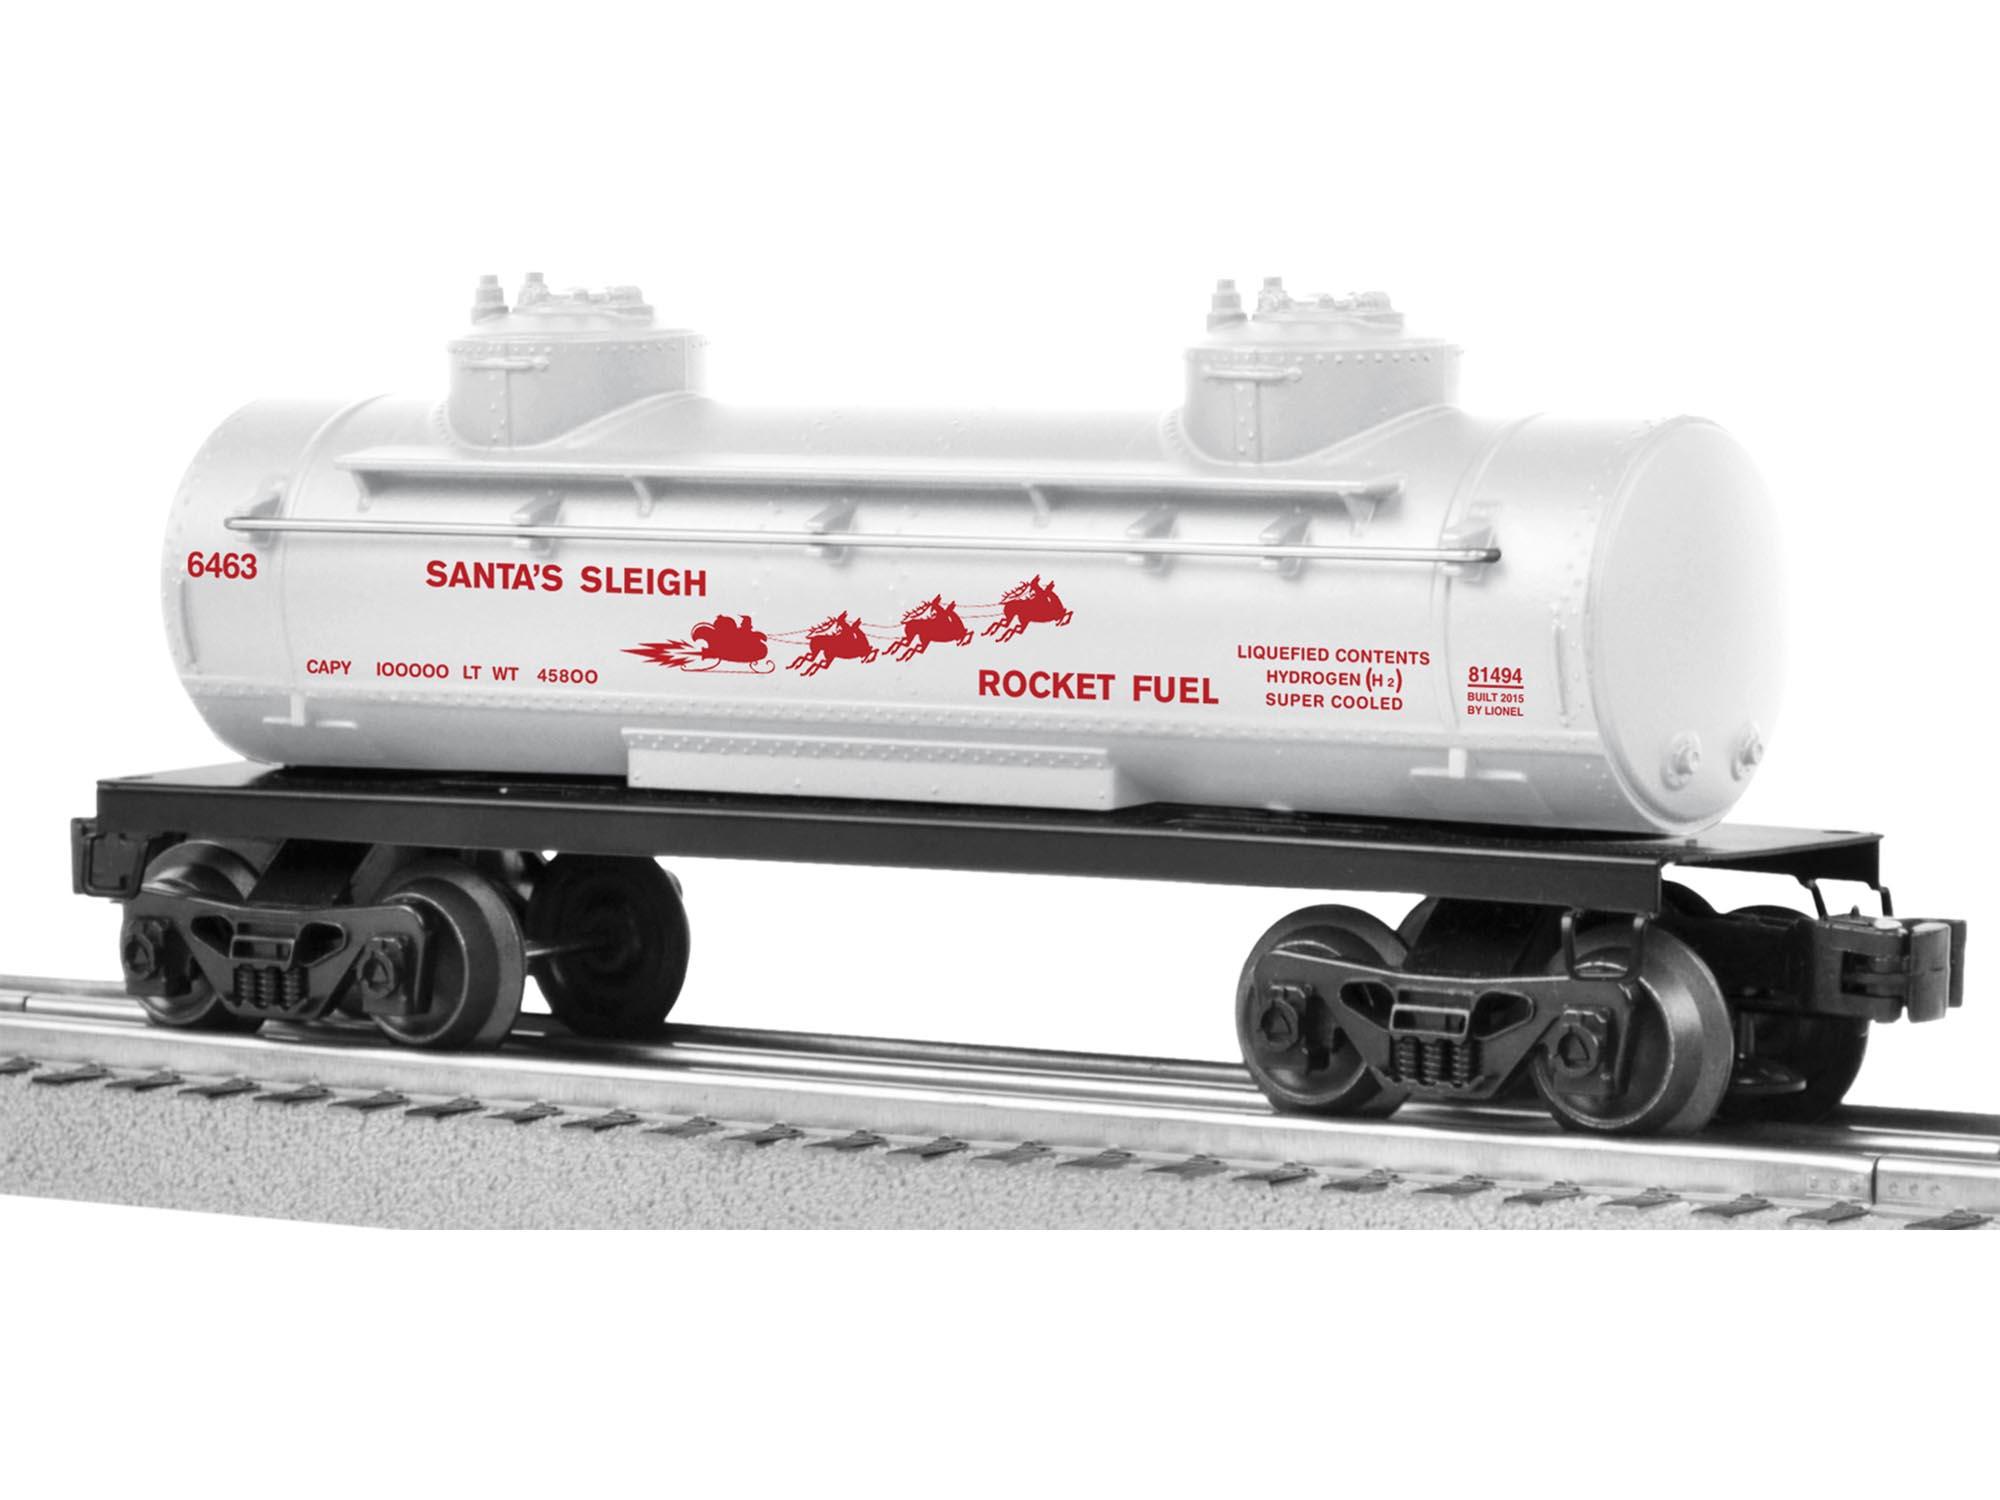 6463 santa s sleigh rocket fuel tank car rh lionel com AAR Cuda Wallpaper Cuda Car